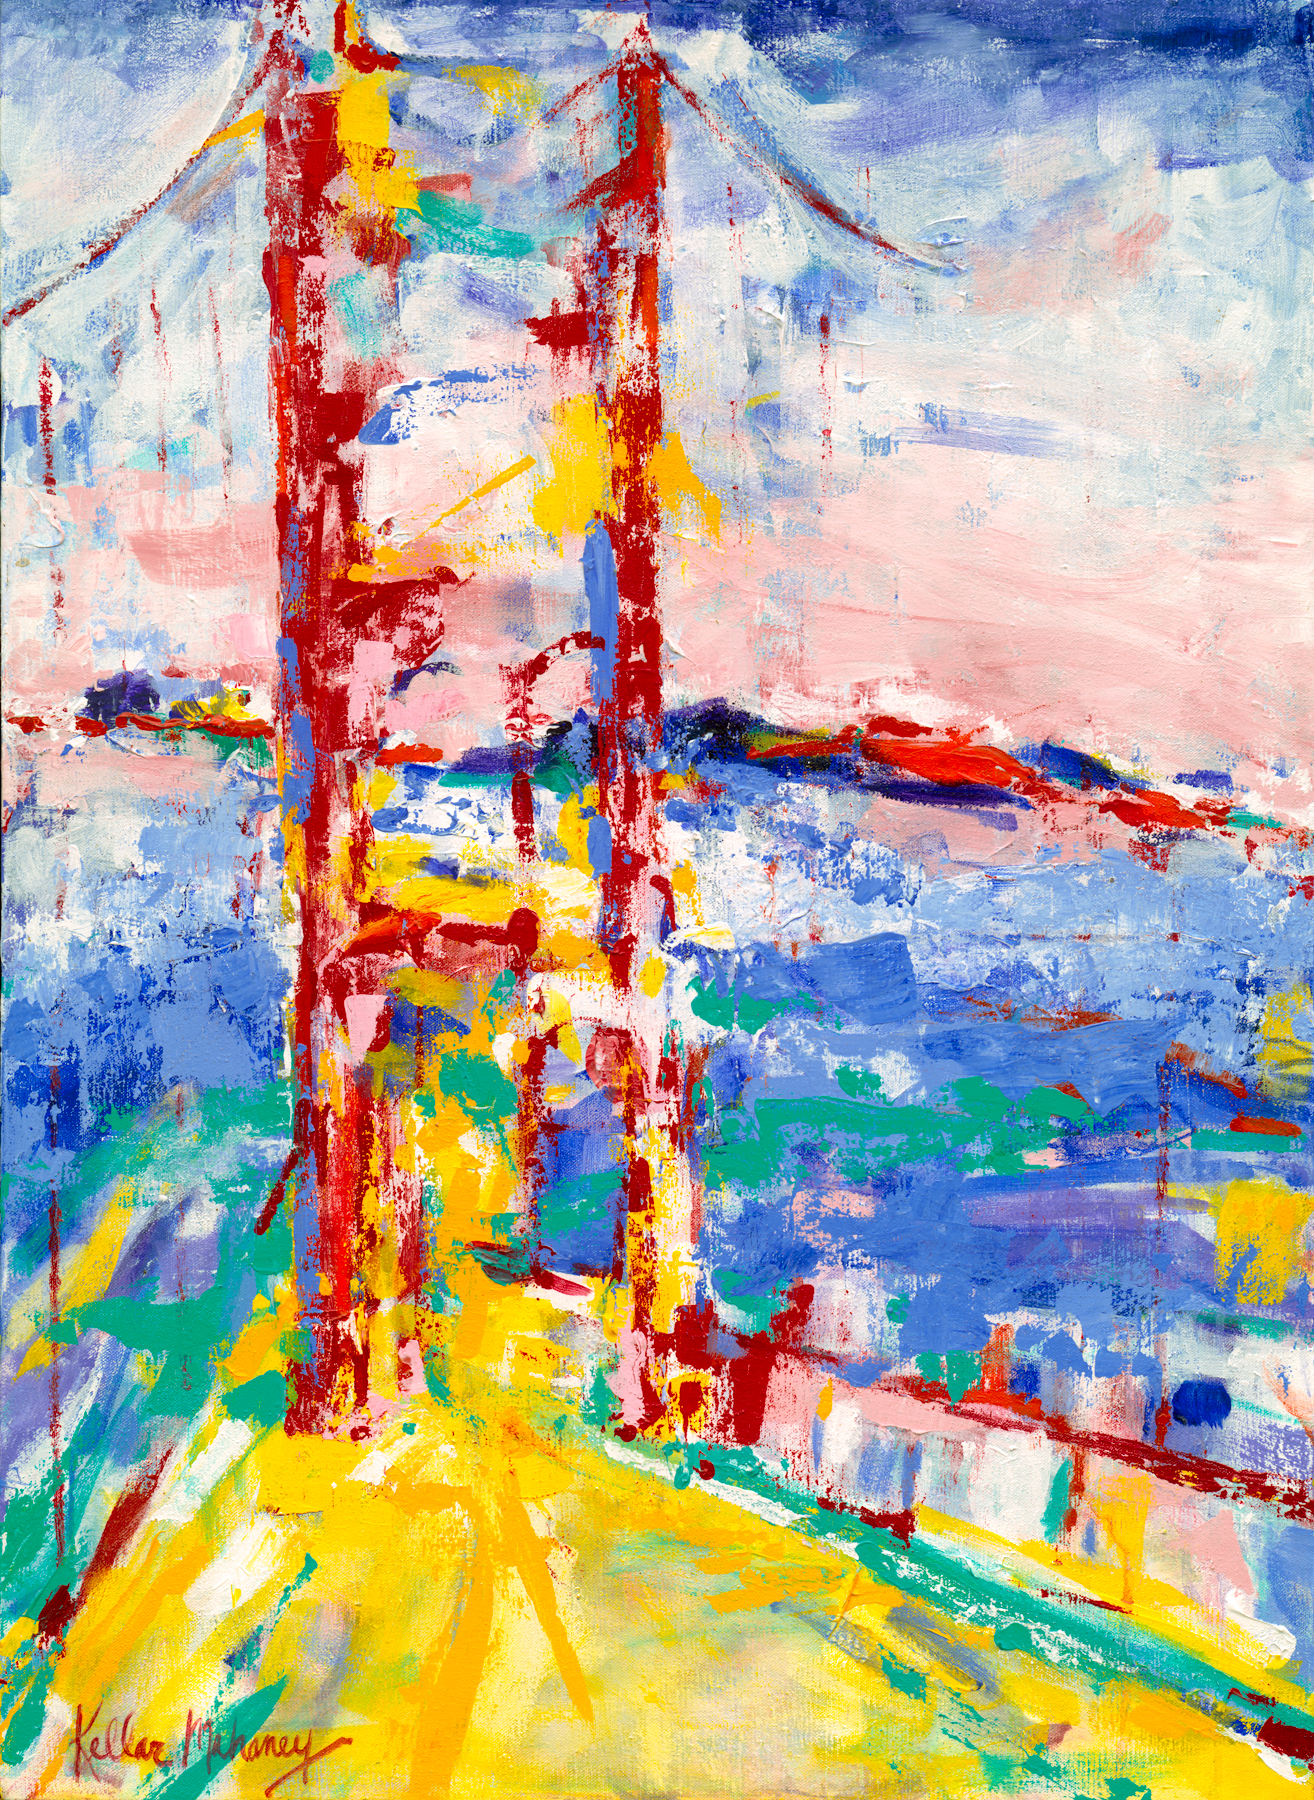 Onto the Golden Gate (2002)